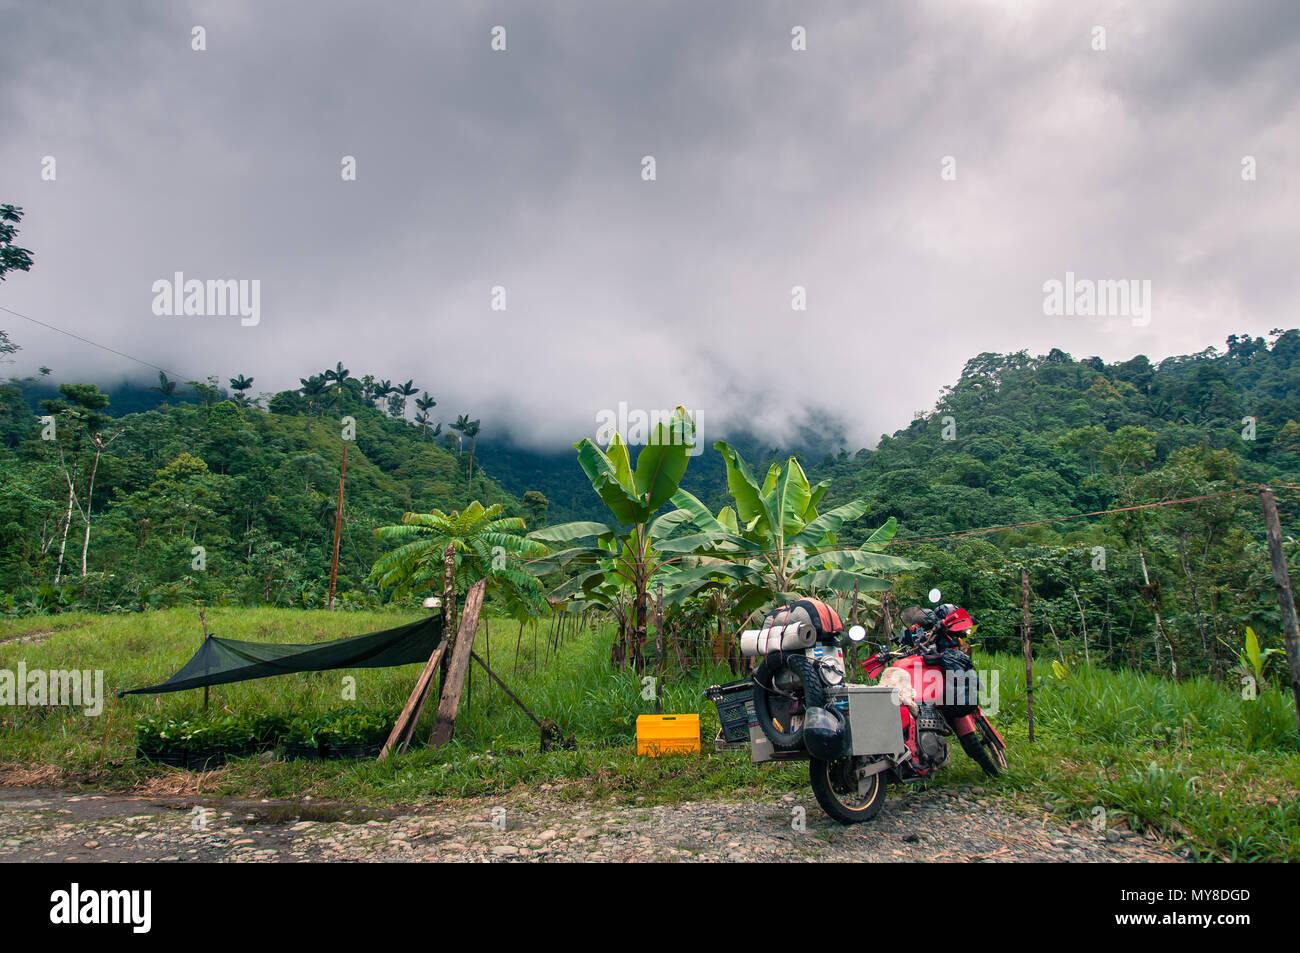 Motorbike and hammock in rural setting, Quito, Pichincha, Ecuador - Stock Image